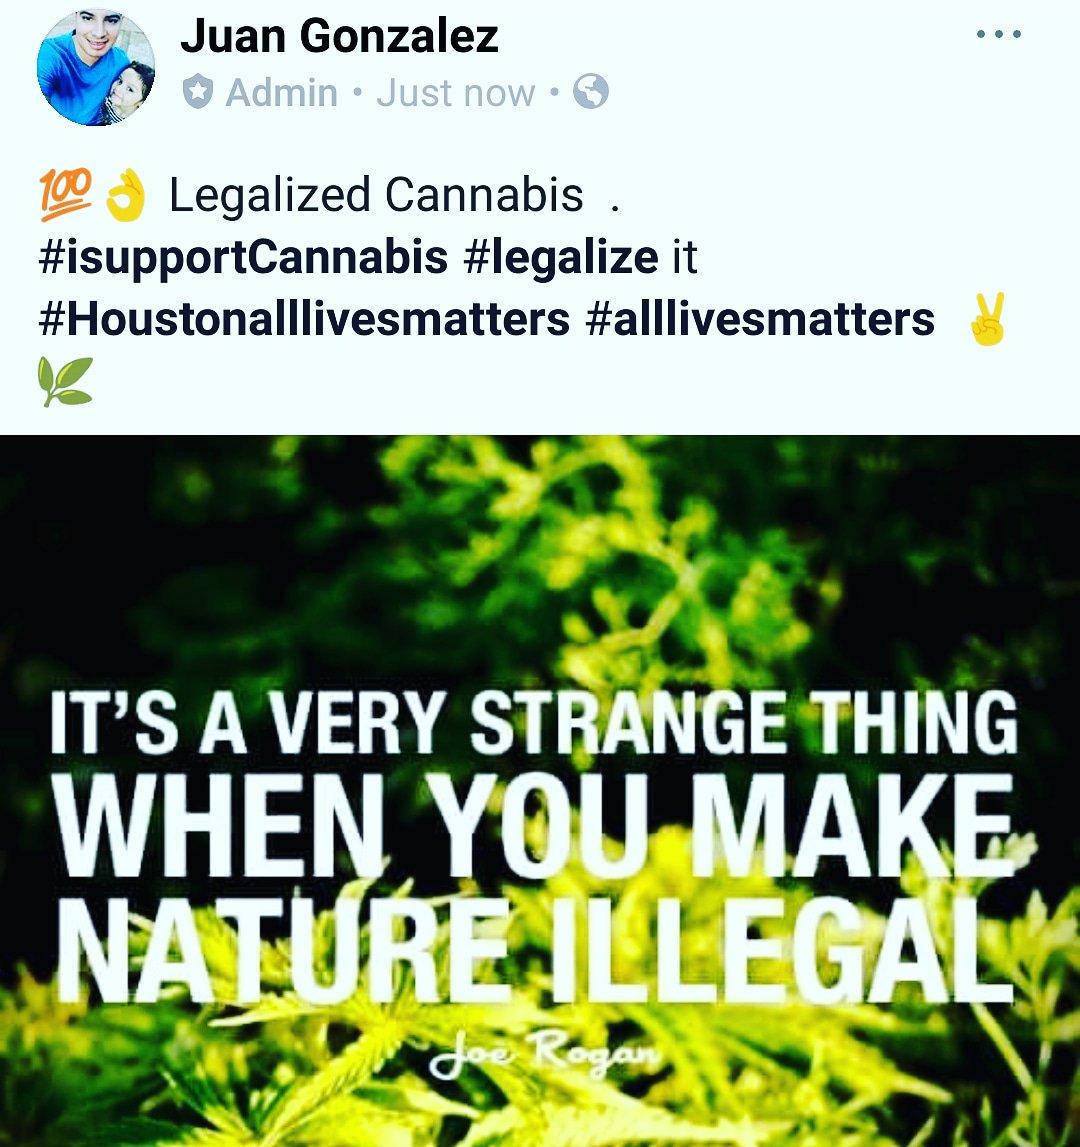 Legalize it #alllivesmatters #Isupportcannabis #canabbis #Follow  #follo4follo  #folloback  #follo4folloback #alllivesmatters #houstonalllivesmatters <br>http://pic.twitter.com/FiWfiUxgEy